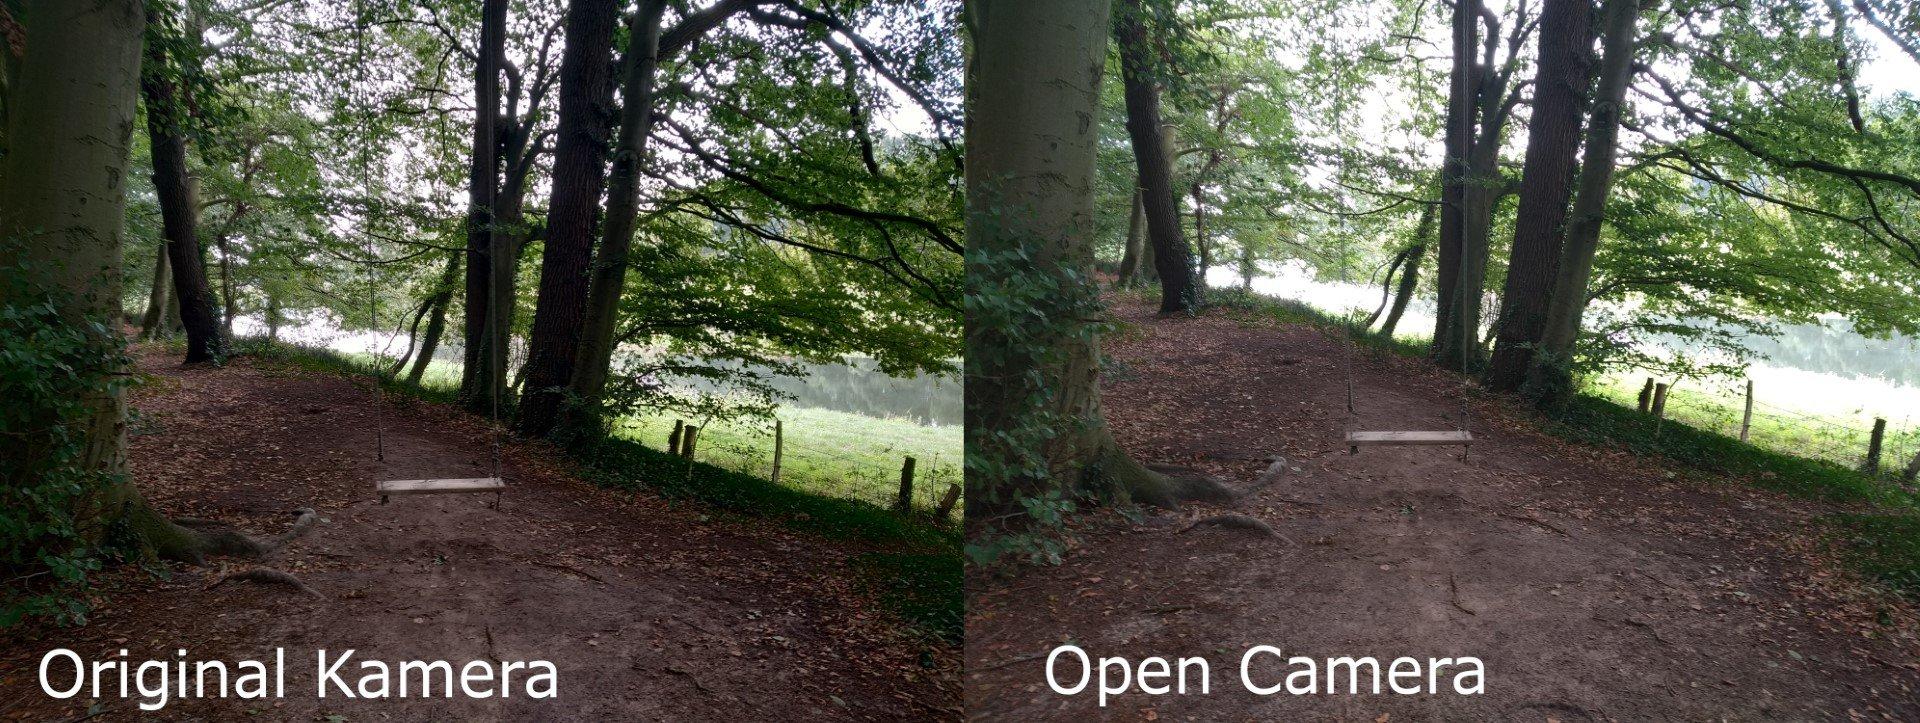 Original vs OpenCamera